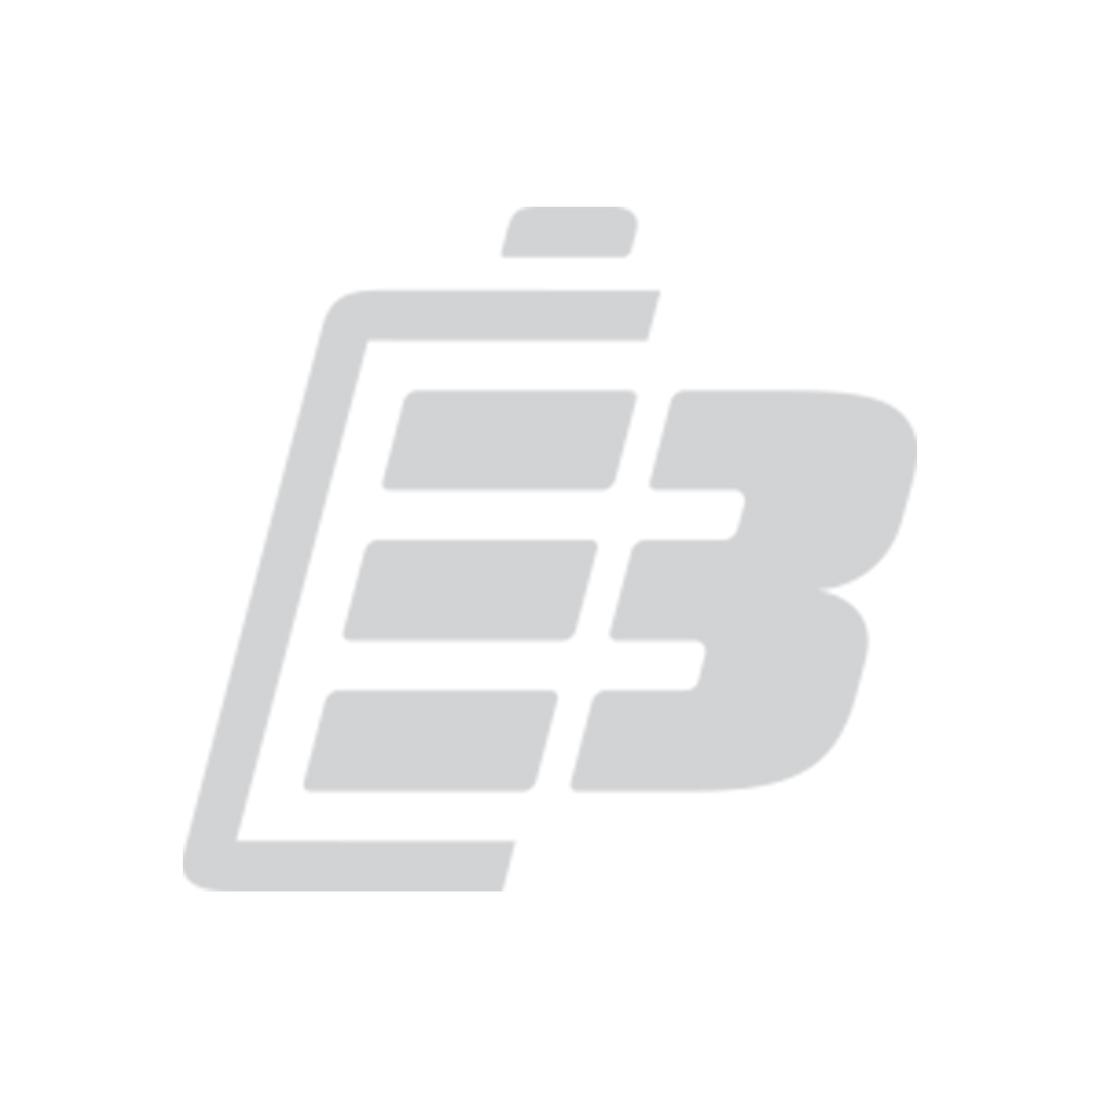 Tablet battery HP ElitePad 900 G1_1